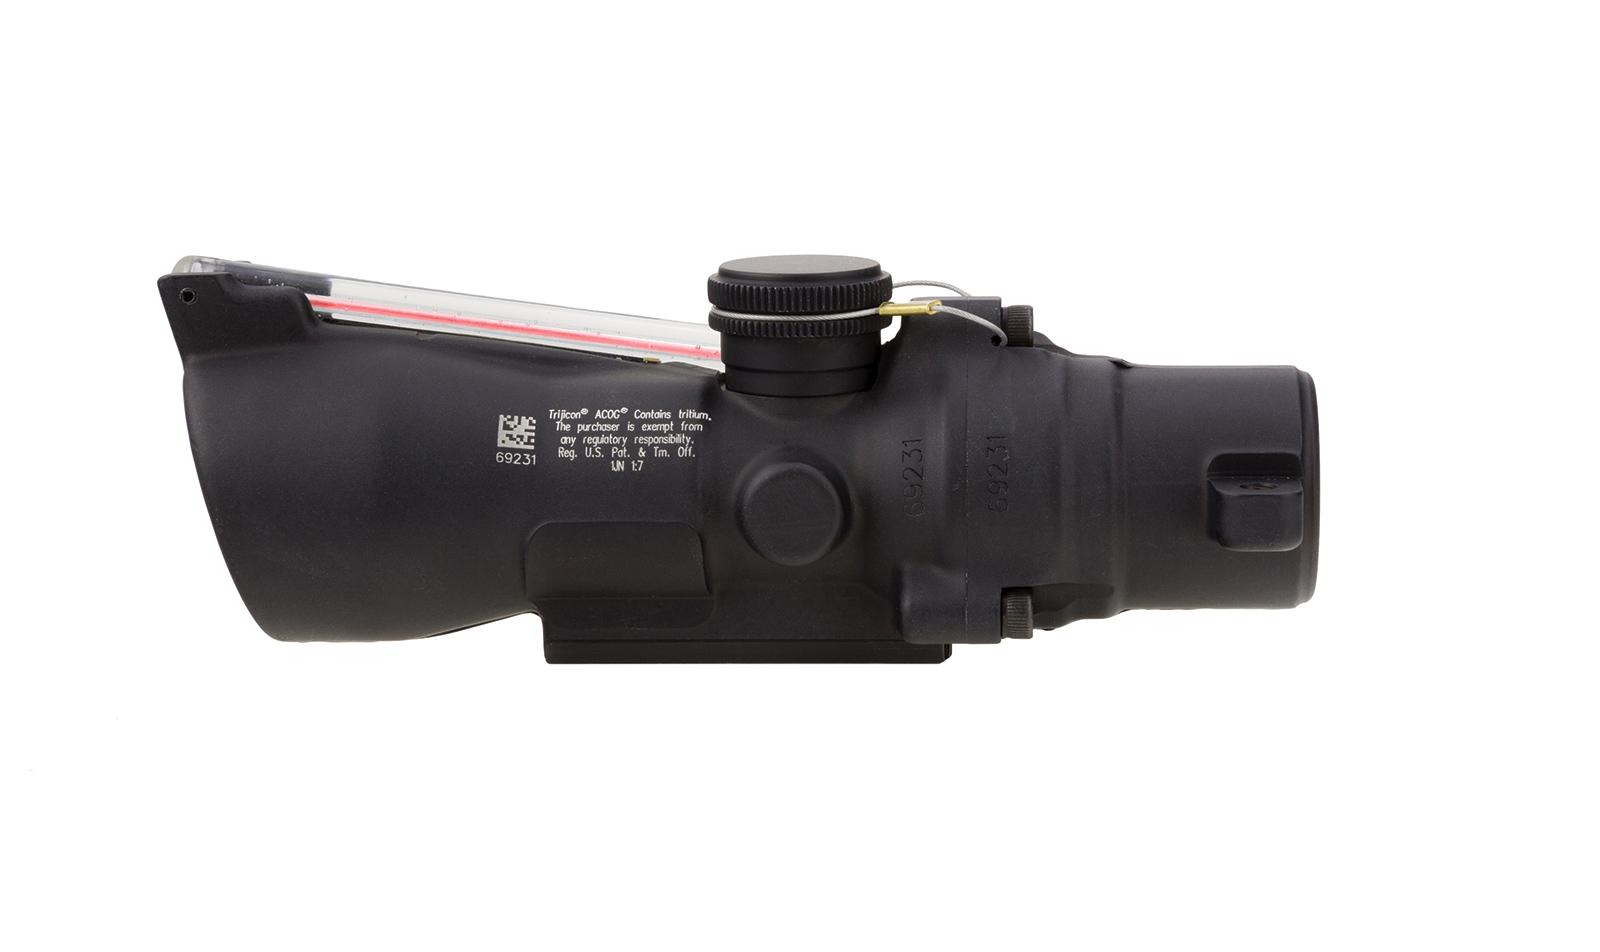 TA50-C-400238 angle 2